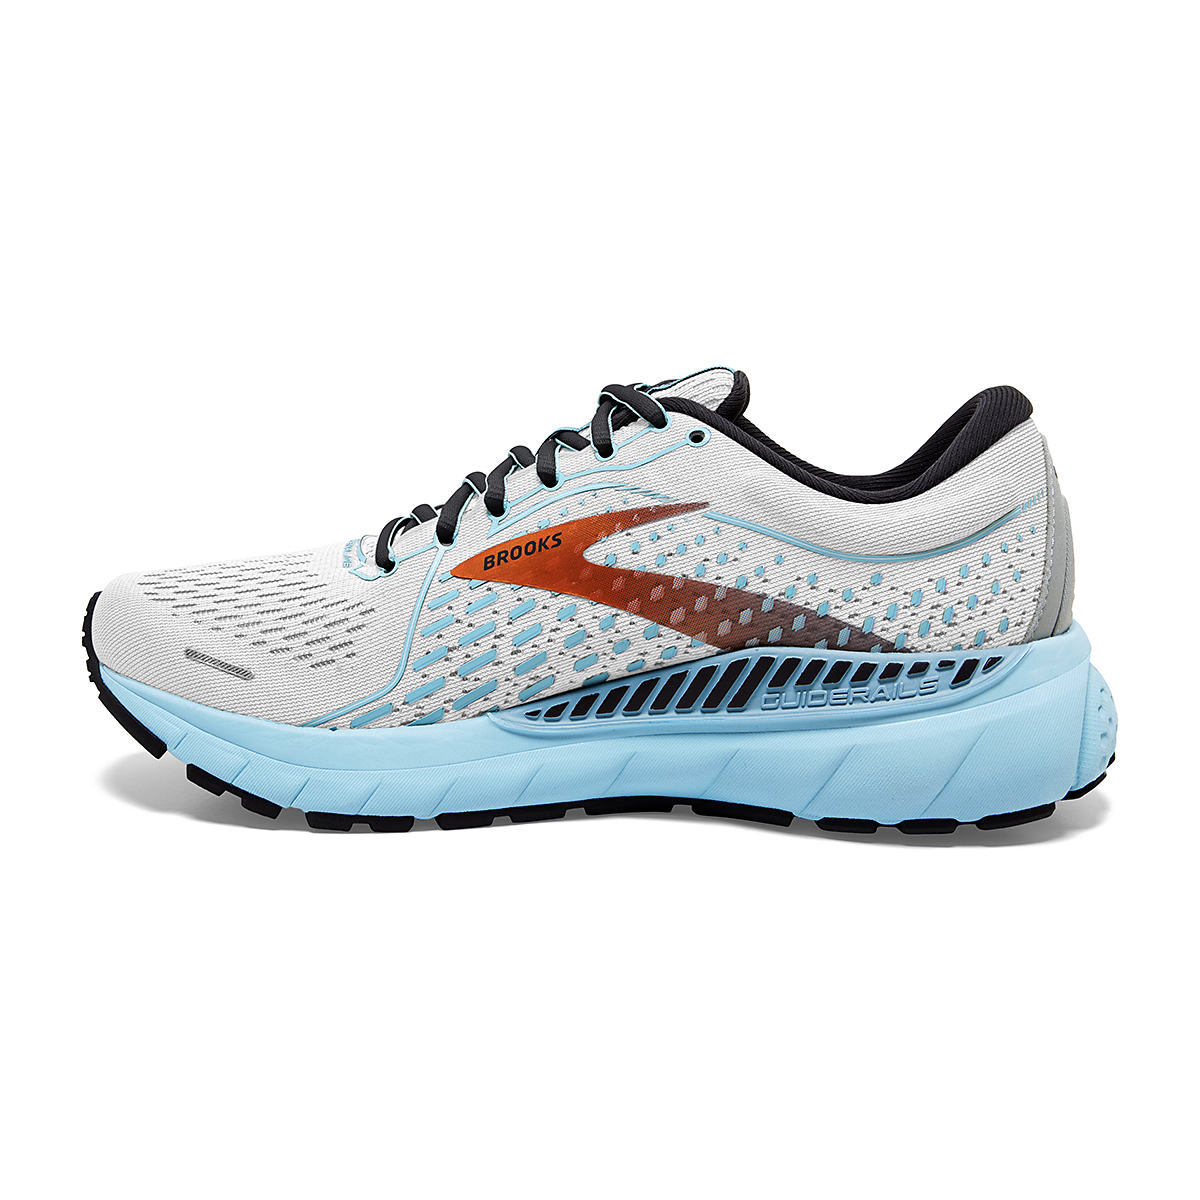 Women's Brooks Adrenaline GTS 21 Running Shoe - Color: White/Alloy - Size: 5 - Width: Regular, White/Alloy, large, image 2